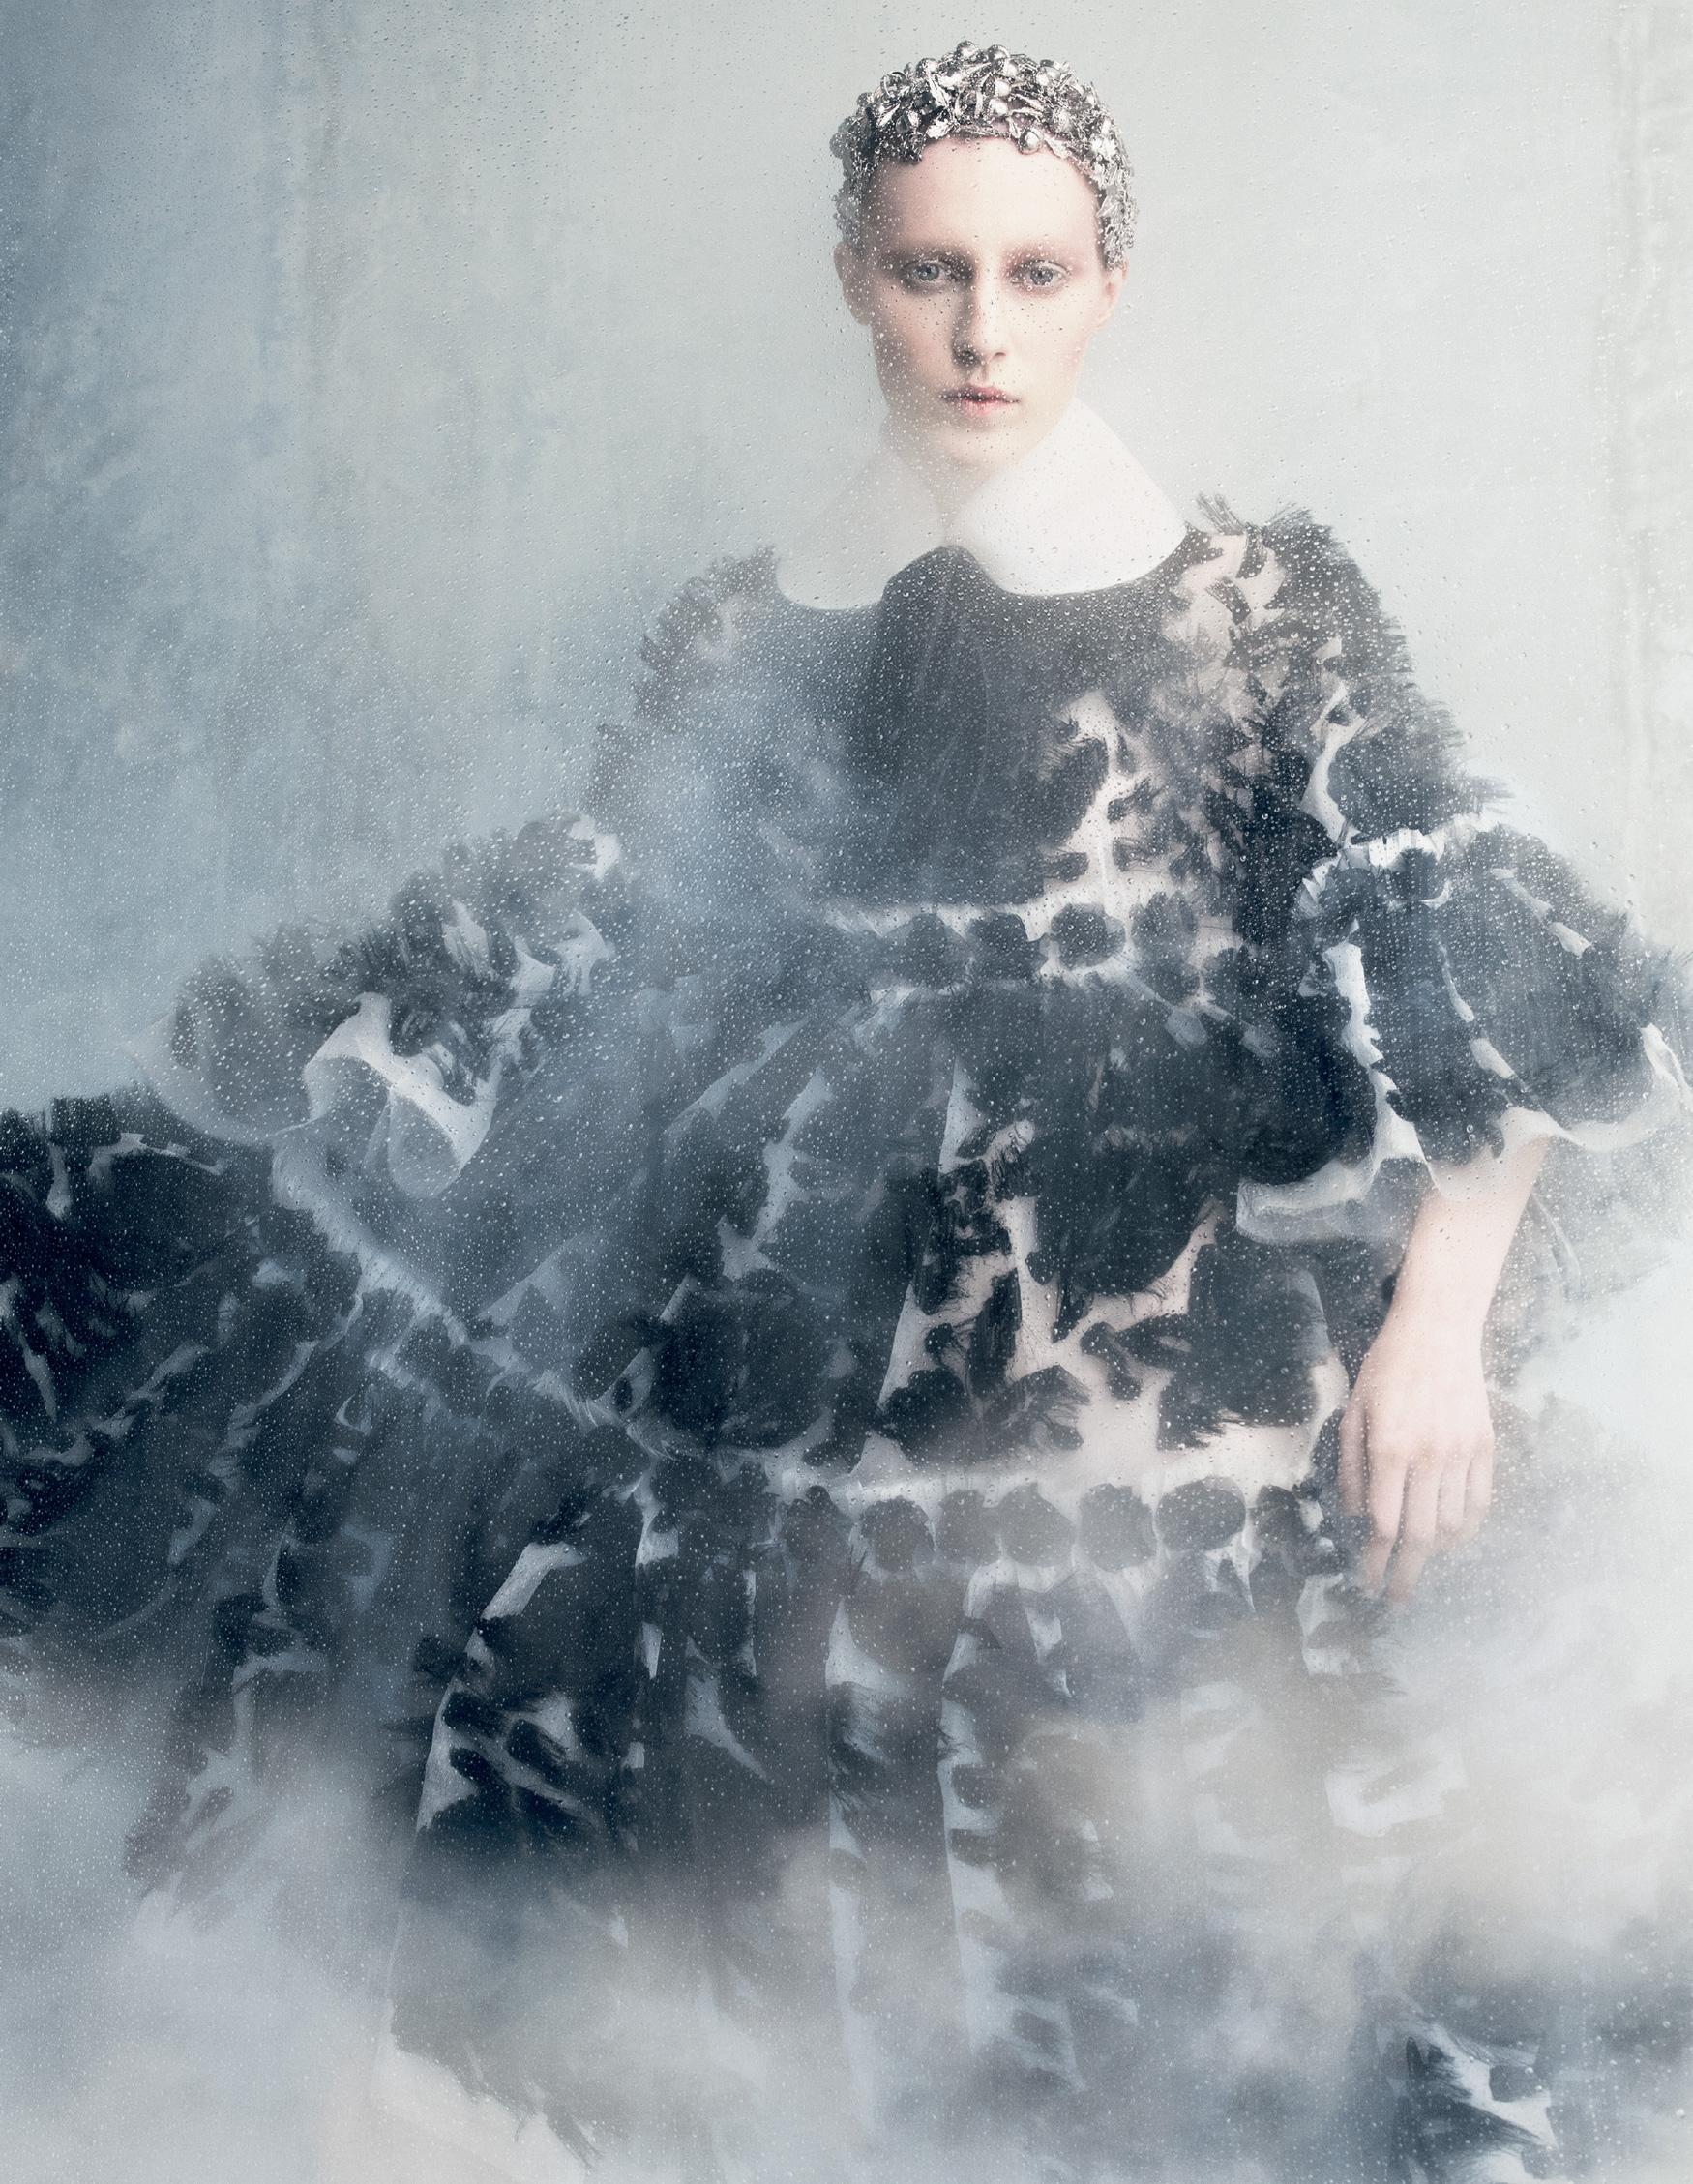 Giovanna-Battaglia-Tales-Of-Magic-And-Innocense-Vogue-Japan-Daniel-Iango-V181_150_200.jpg